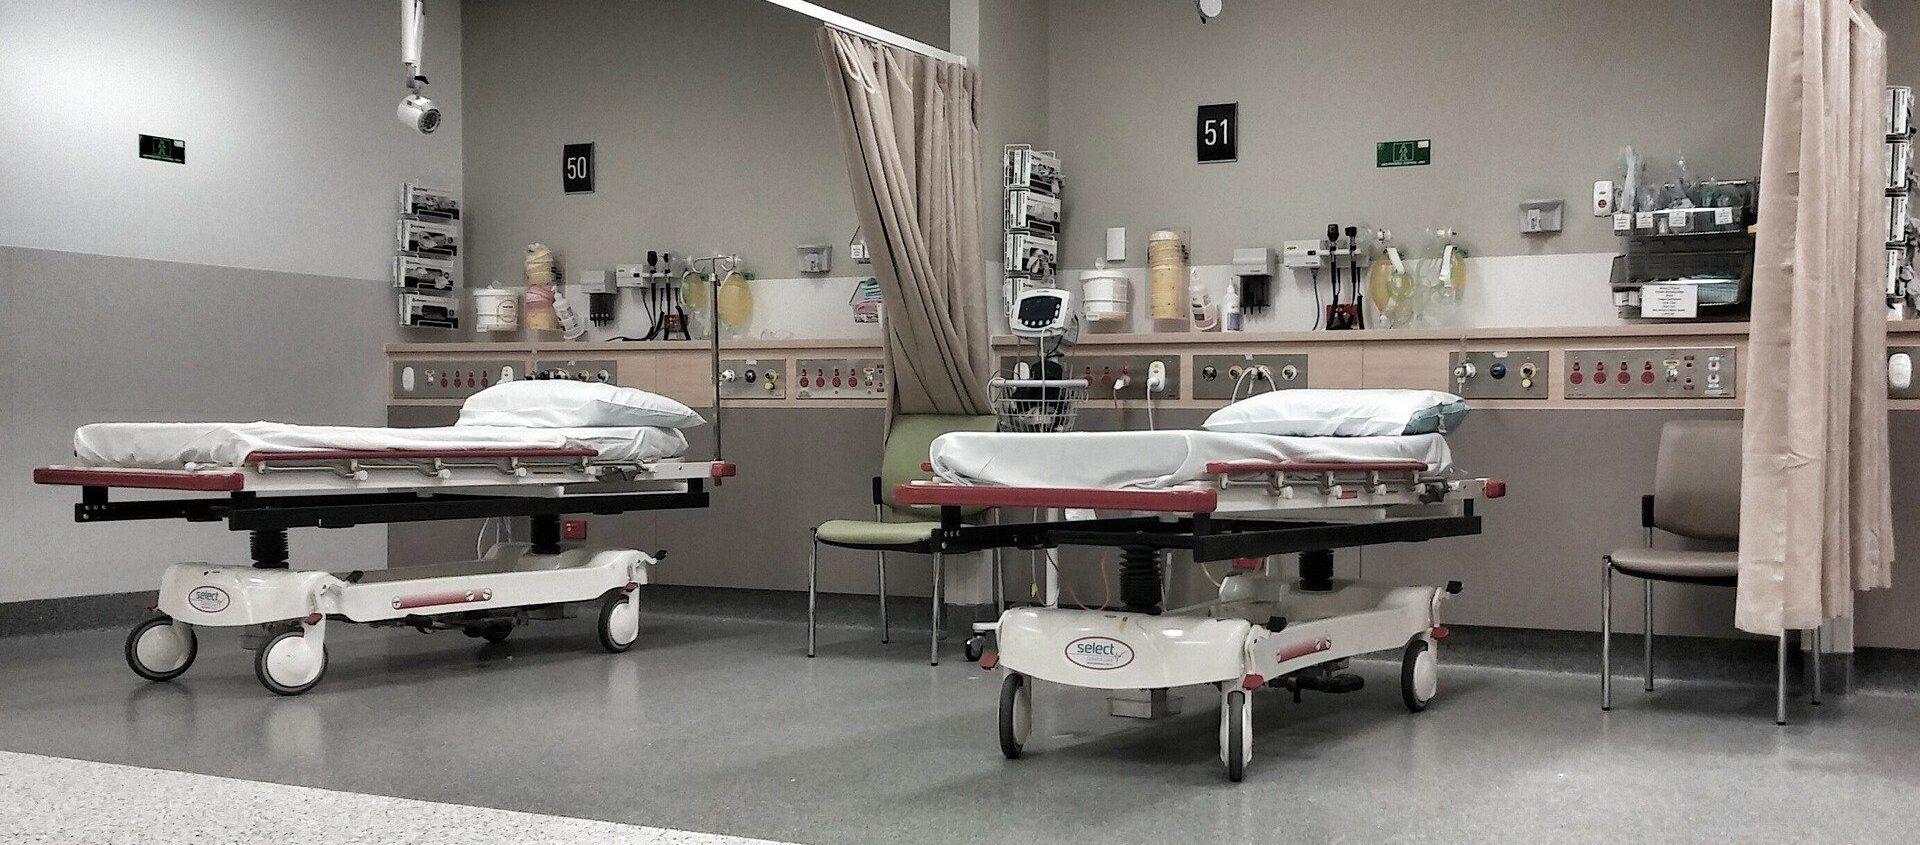 Lits d'hôpital - Sputnik France, 1920, 02.02.2021